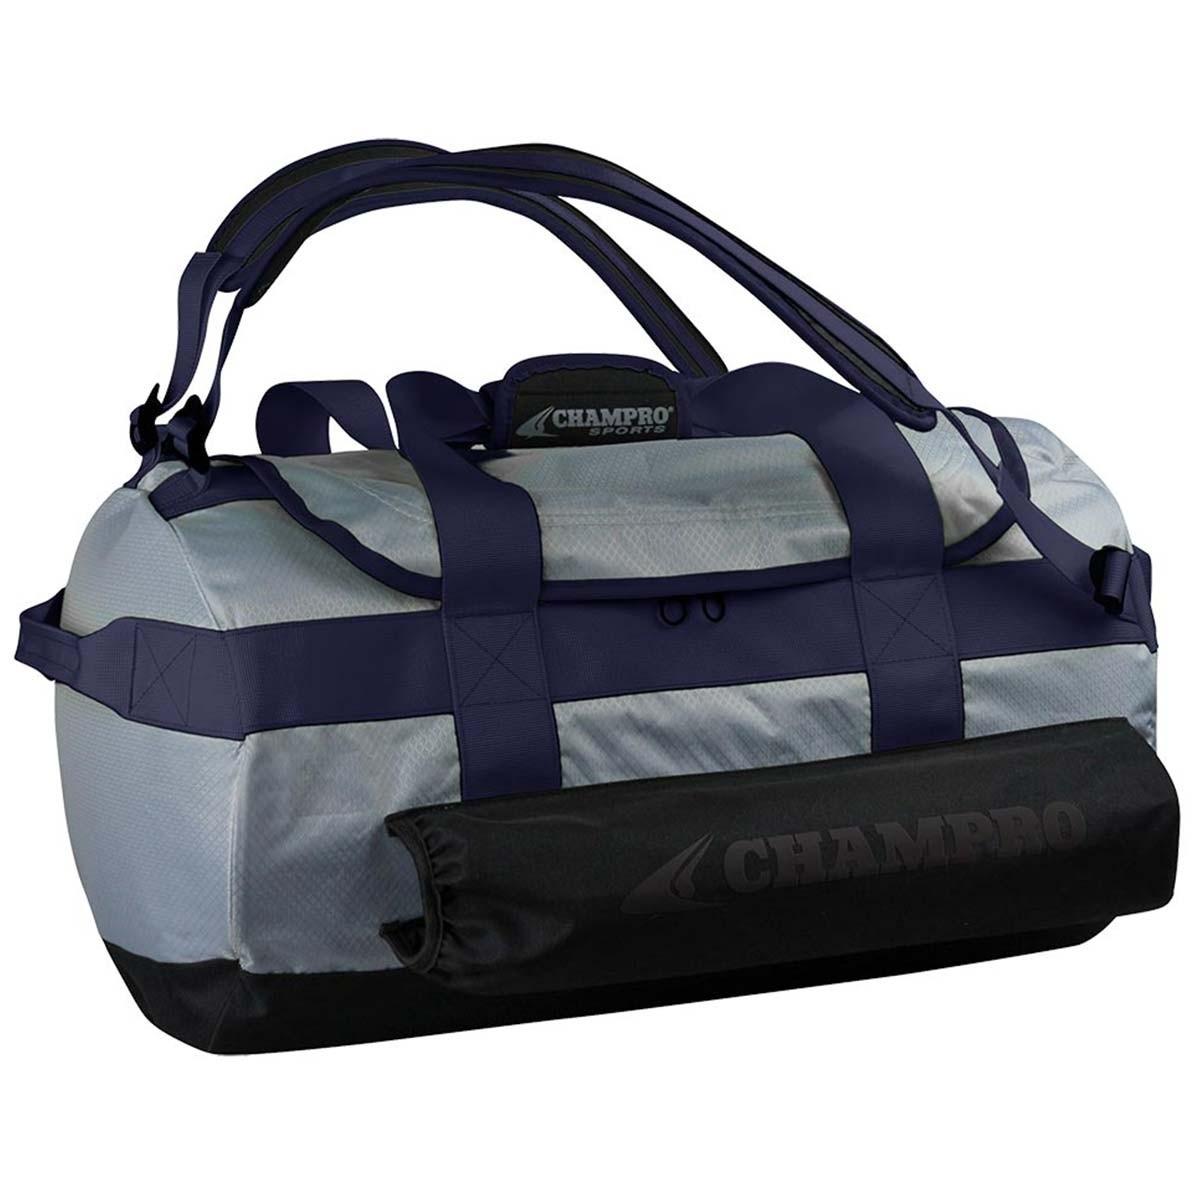 Champro Base Knock Duffle Backpack fa4cd61a4e73c